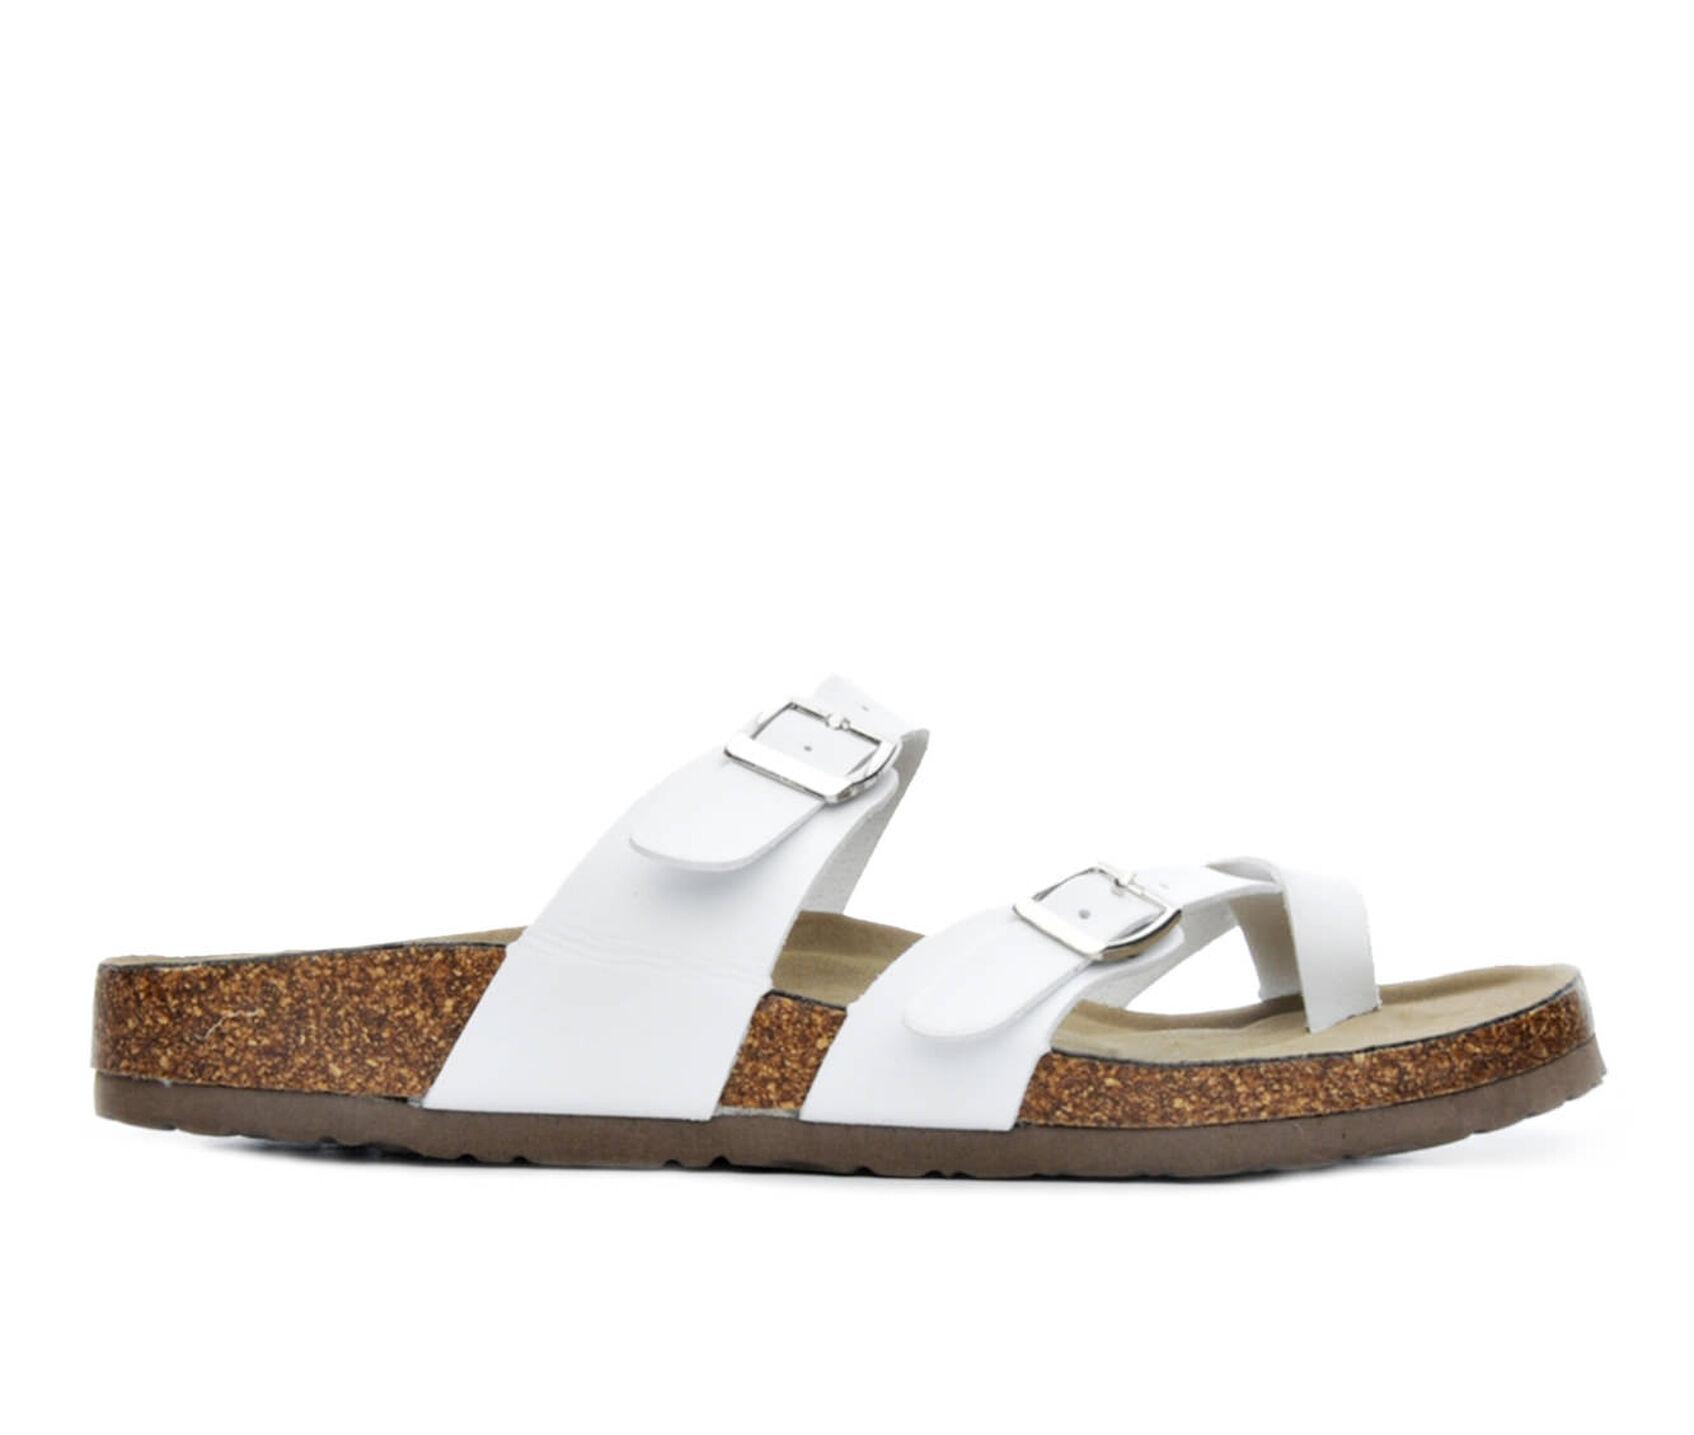 41cf25ba8478 ... Madden Girl Bryceee Footbed Sandals. Carousel Controls